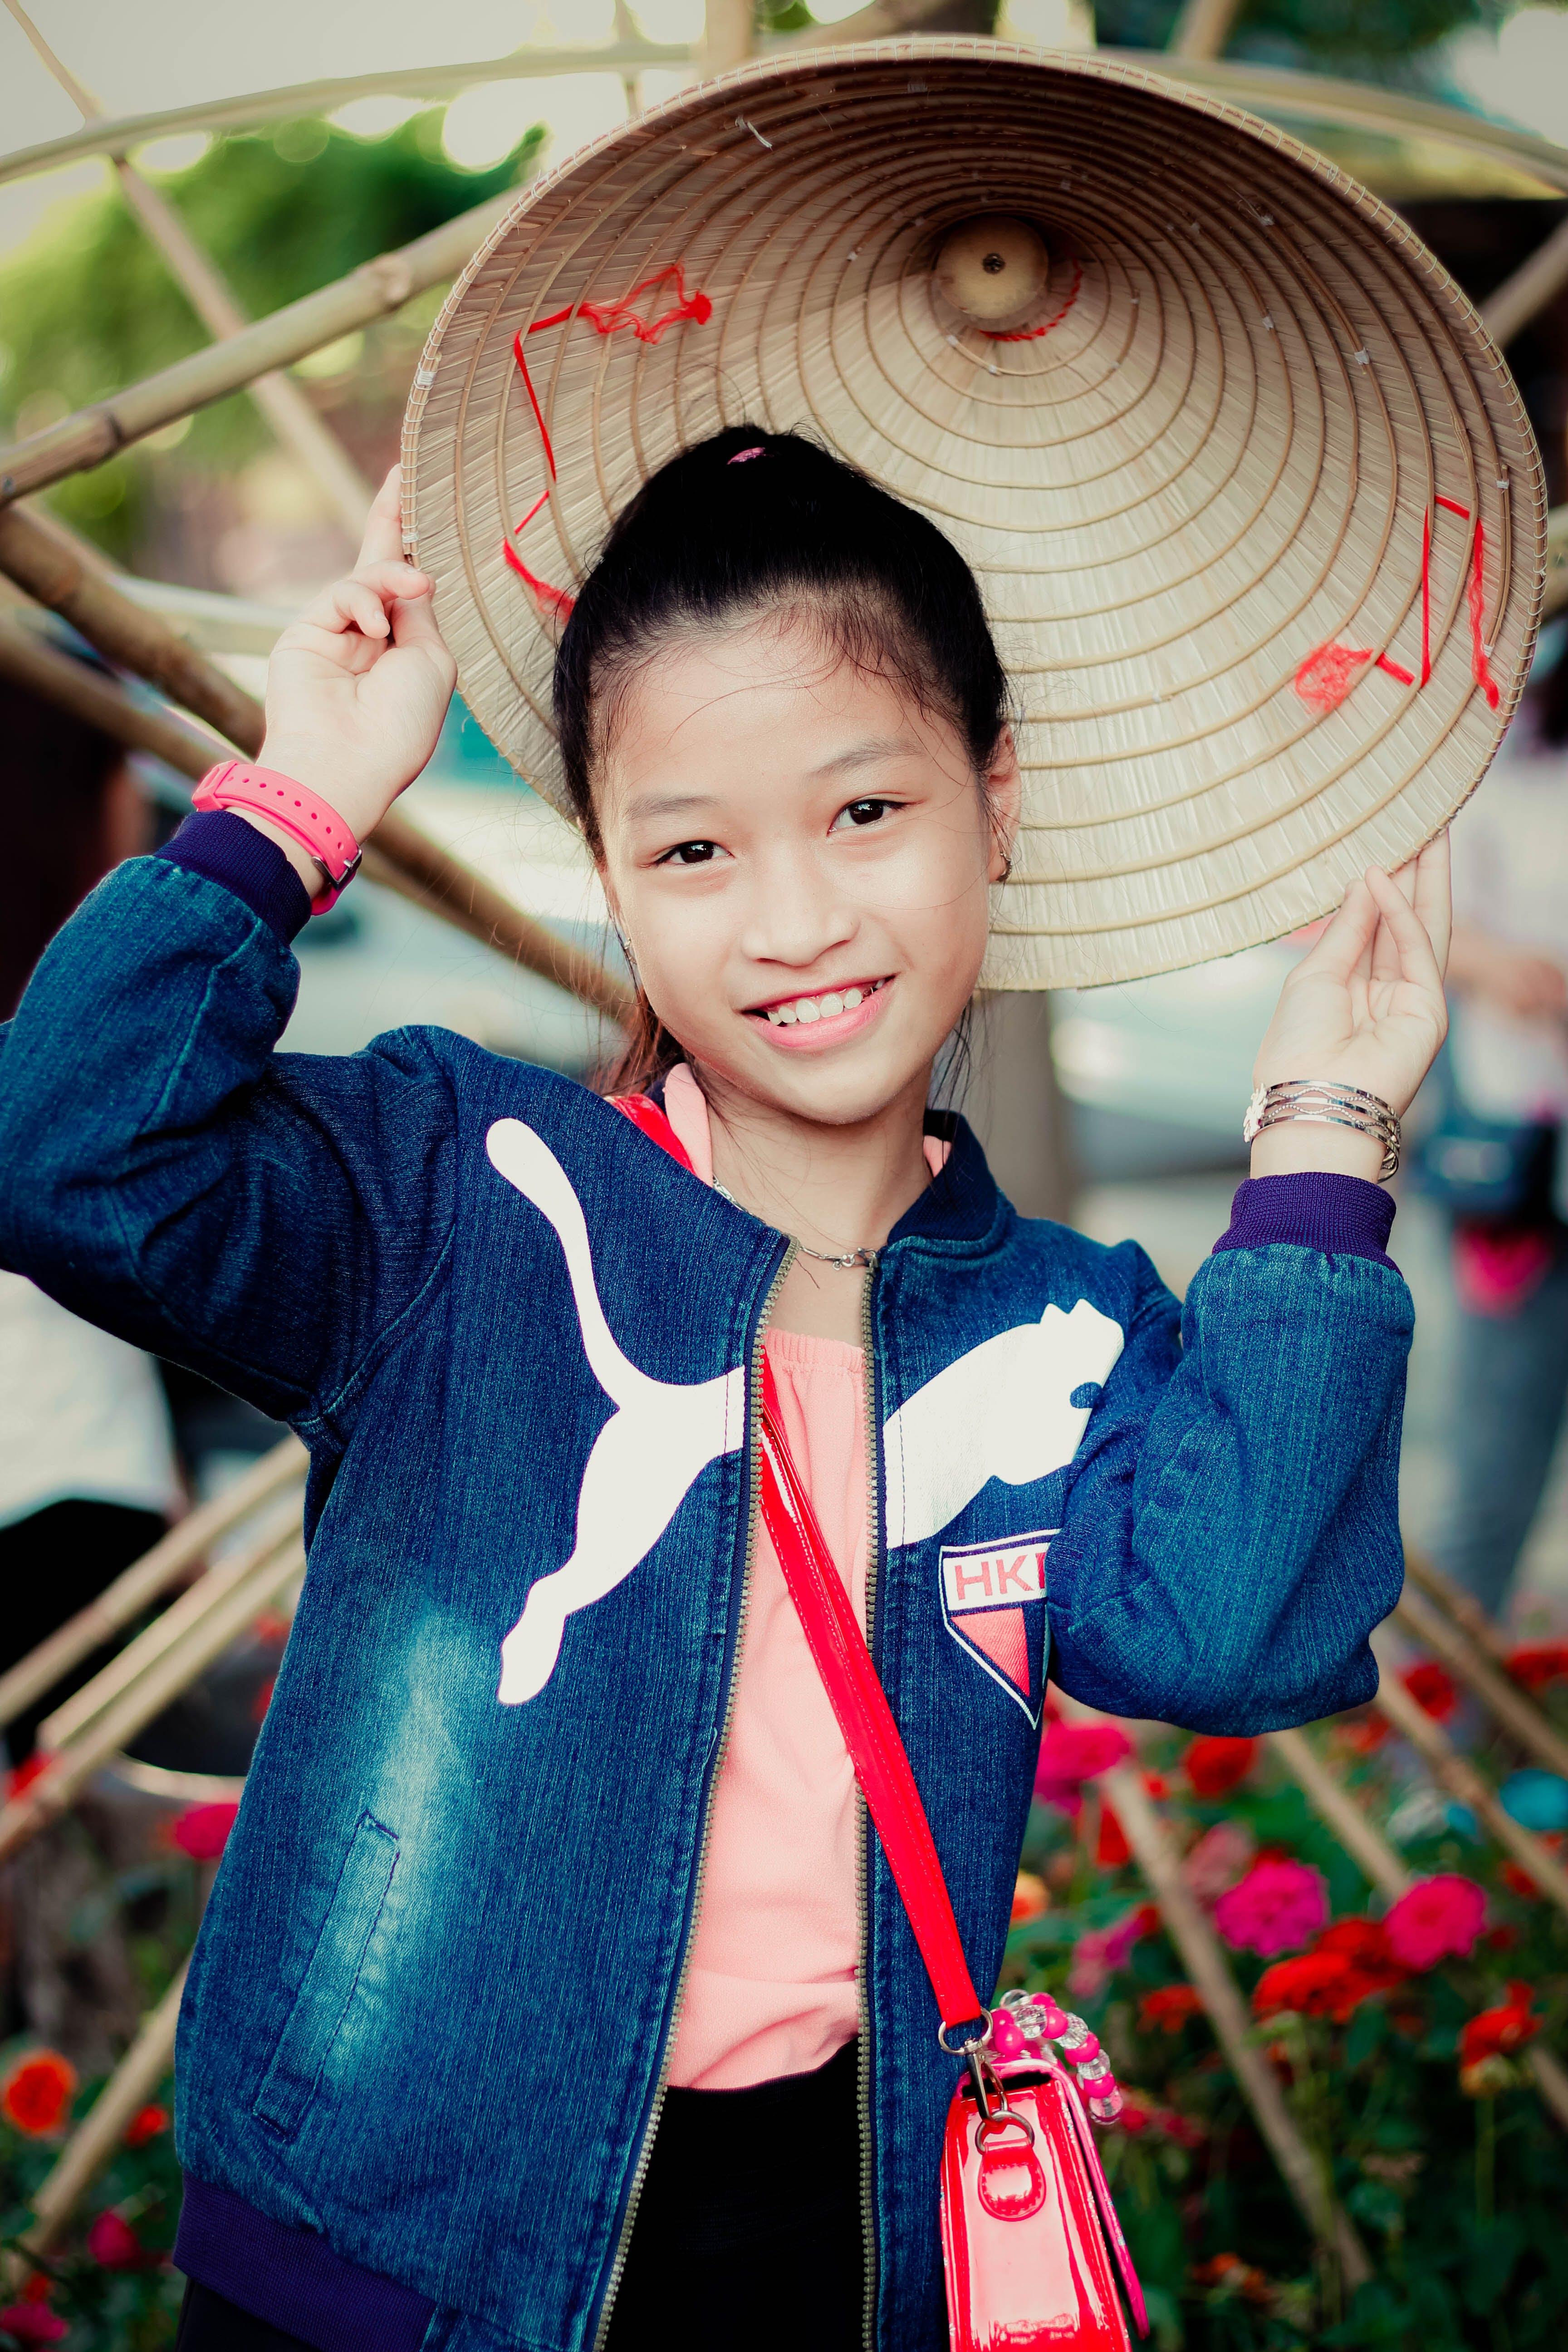 Girl In Blue Puma Denim Zip-up Jacket Smiling